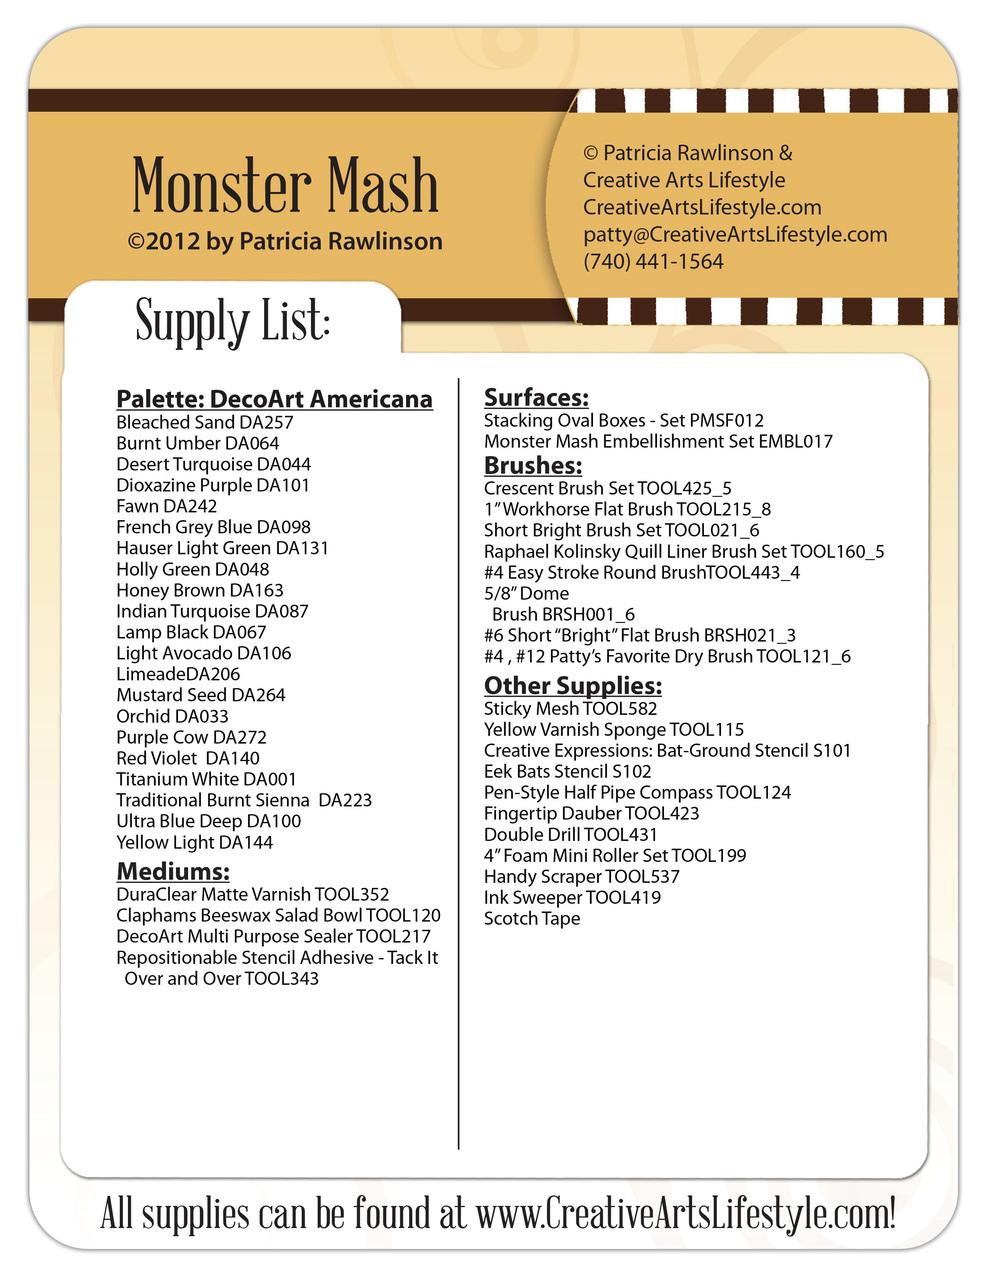 Monster Mash E-Packet - Patricia Rawlinson